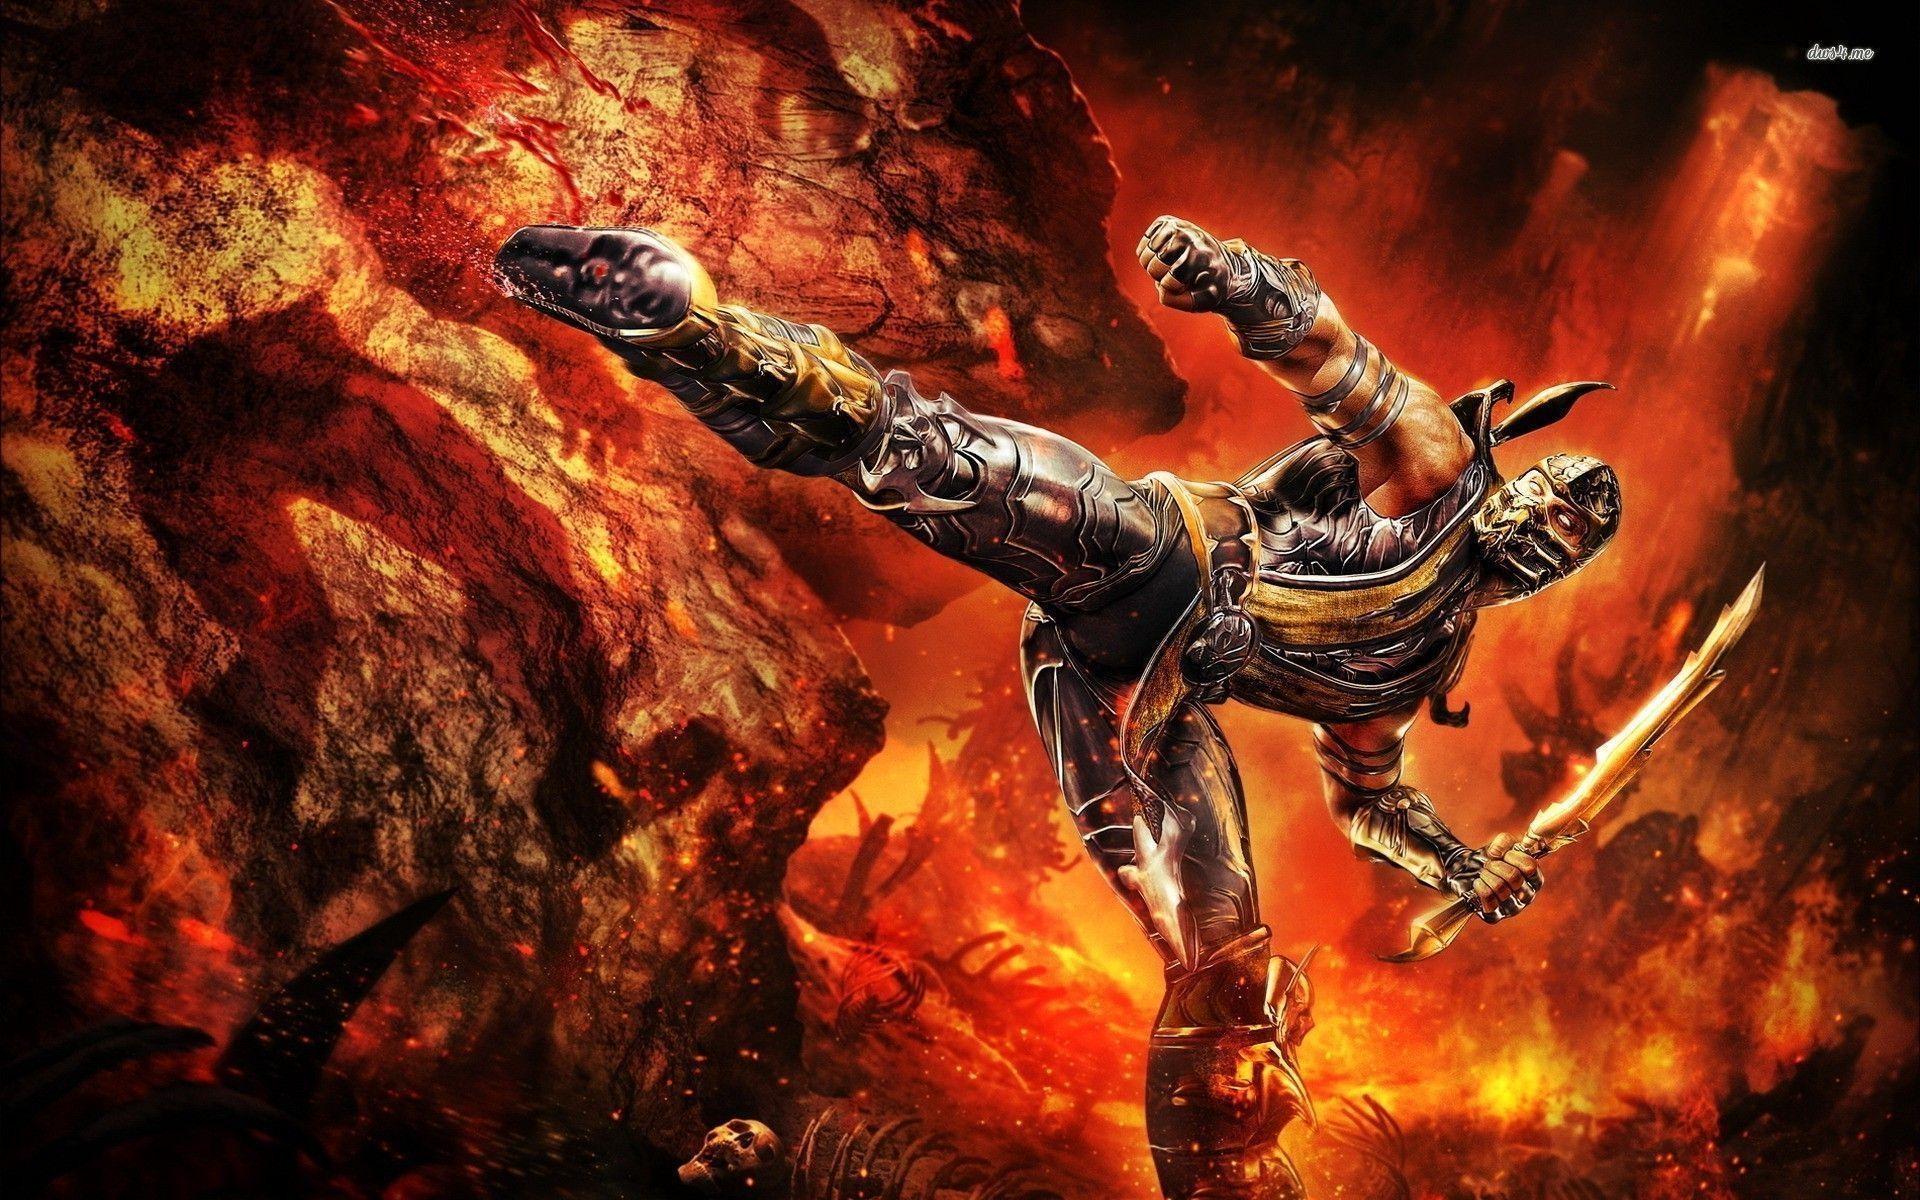 Res: 1920x1200, Mortal Kombat Wallpapers - Full HD wallpaper search